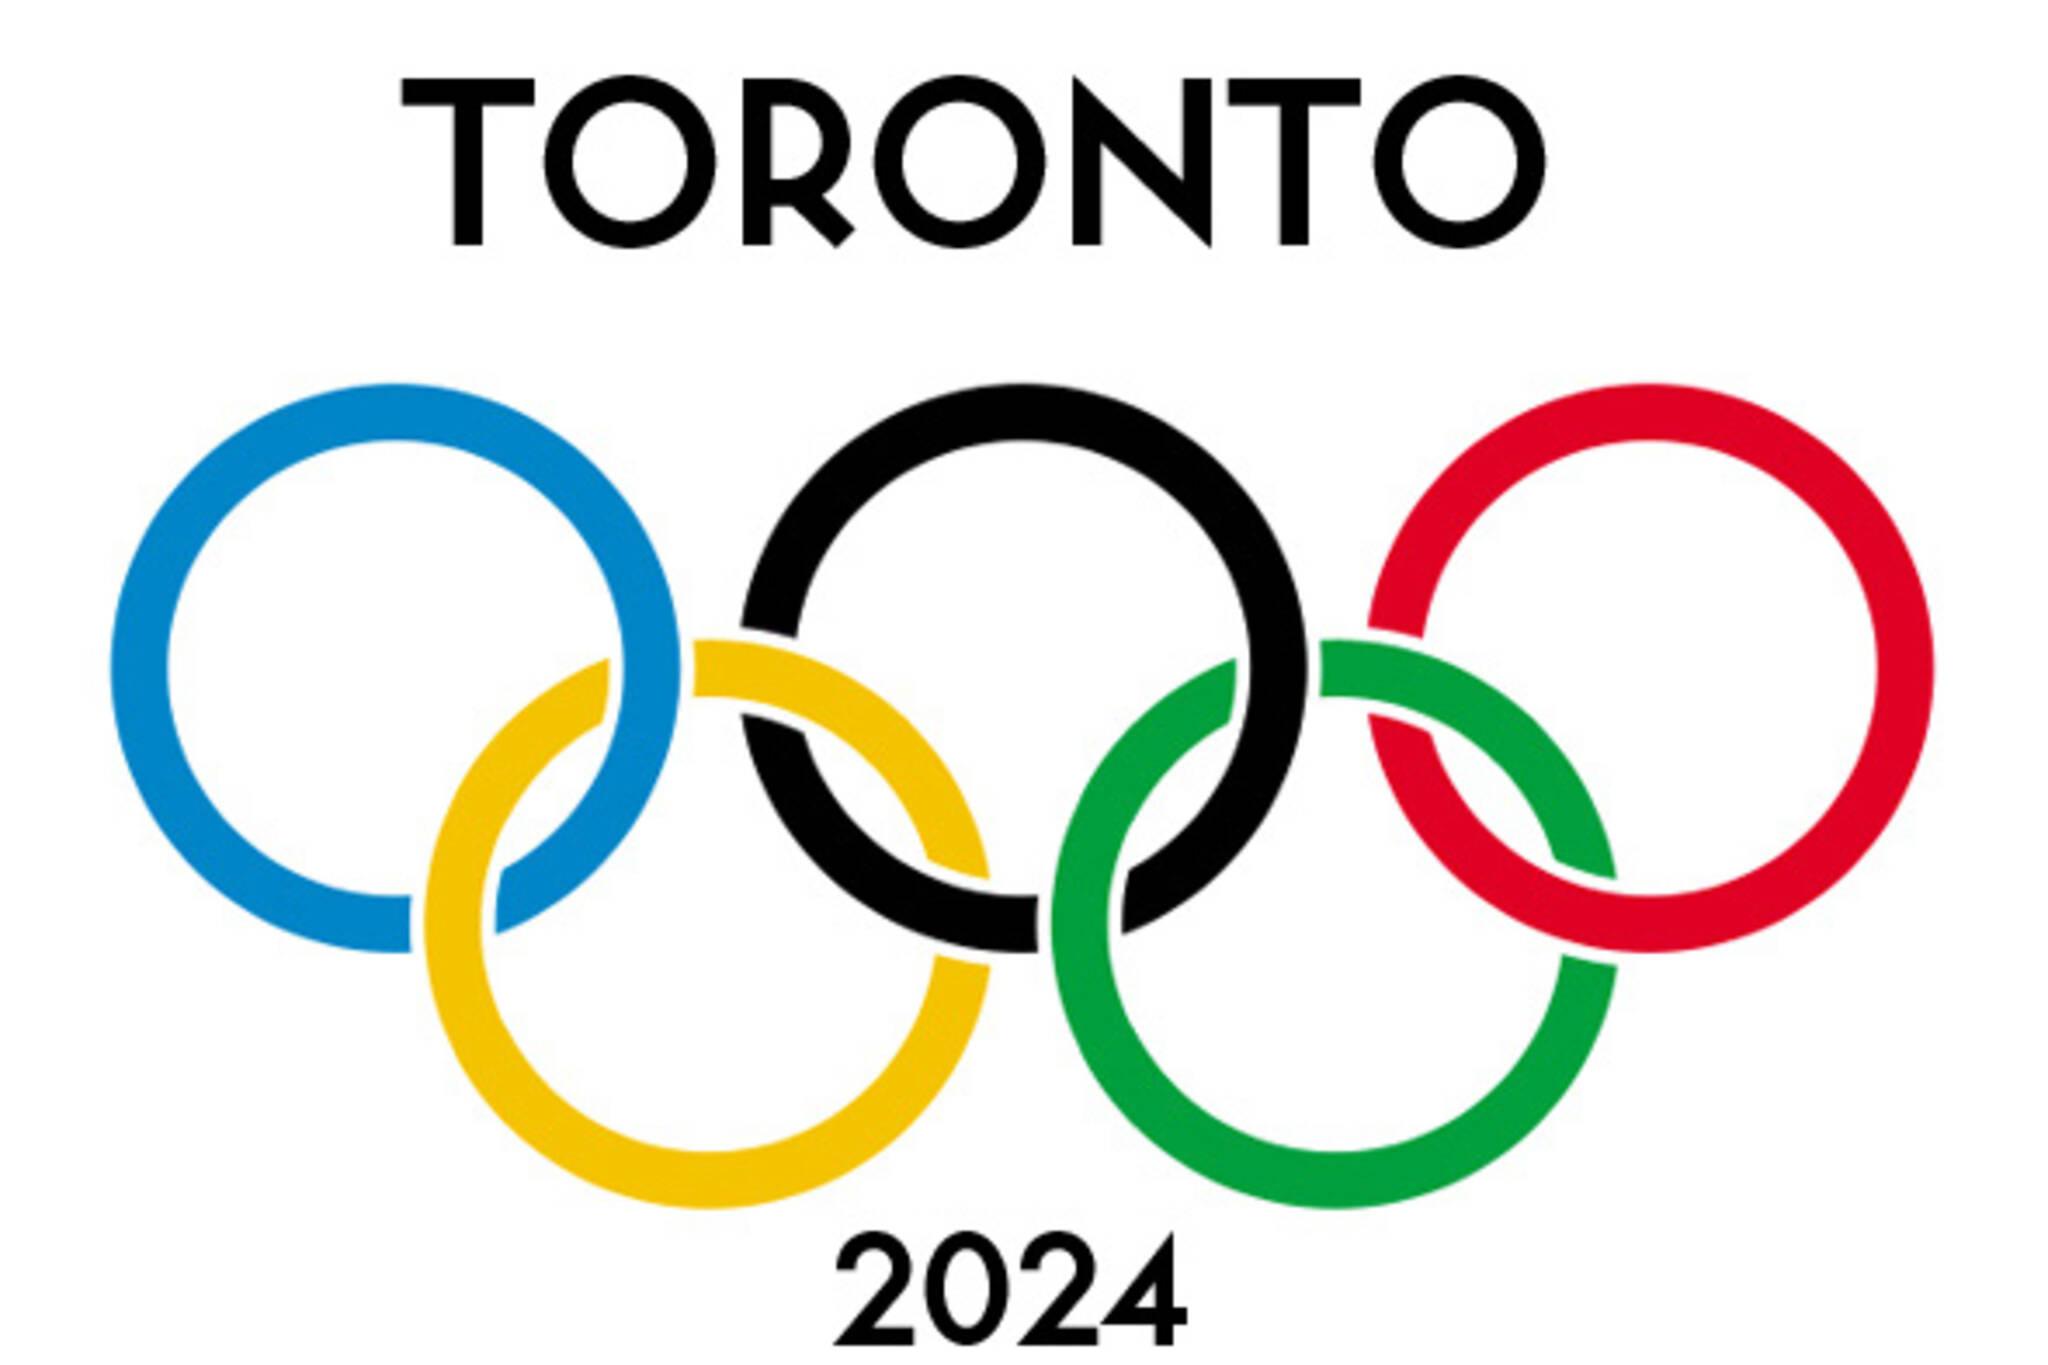 Toronto Olympics 2024